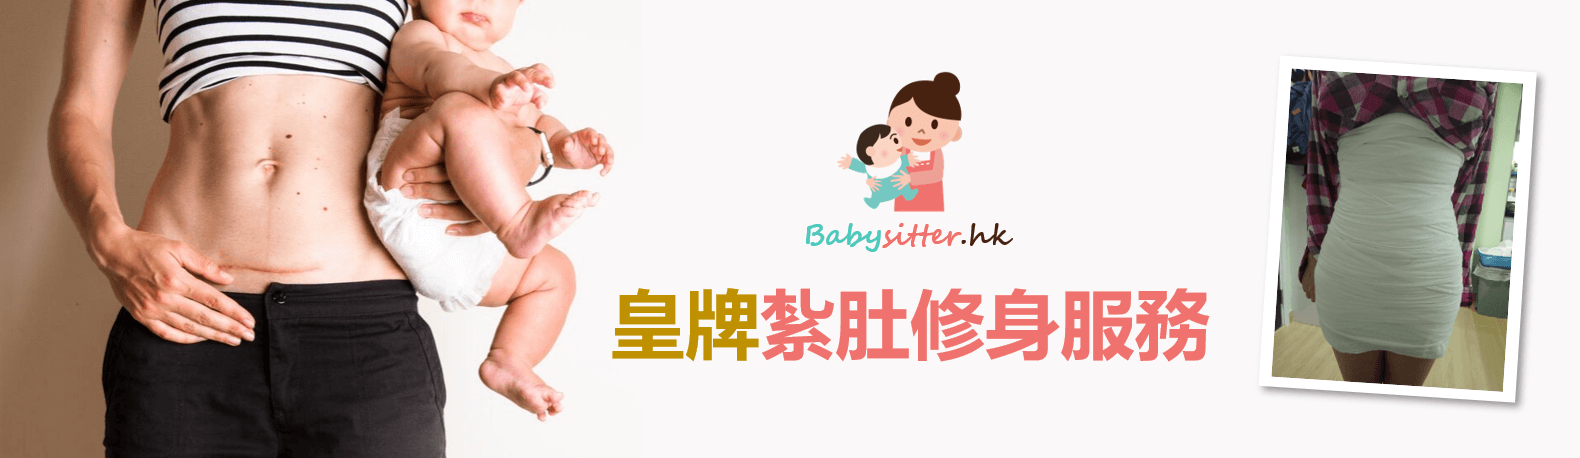 belly-binding_banner01